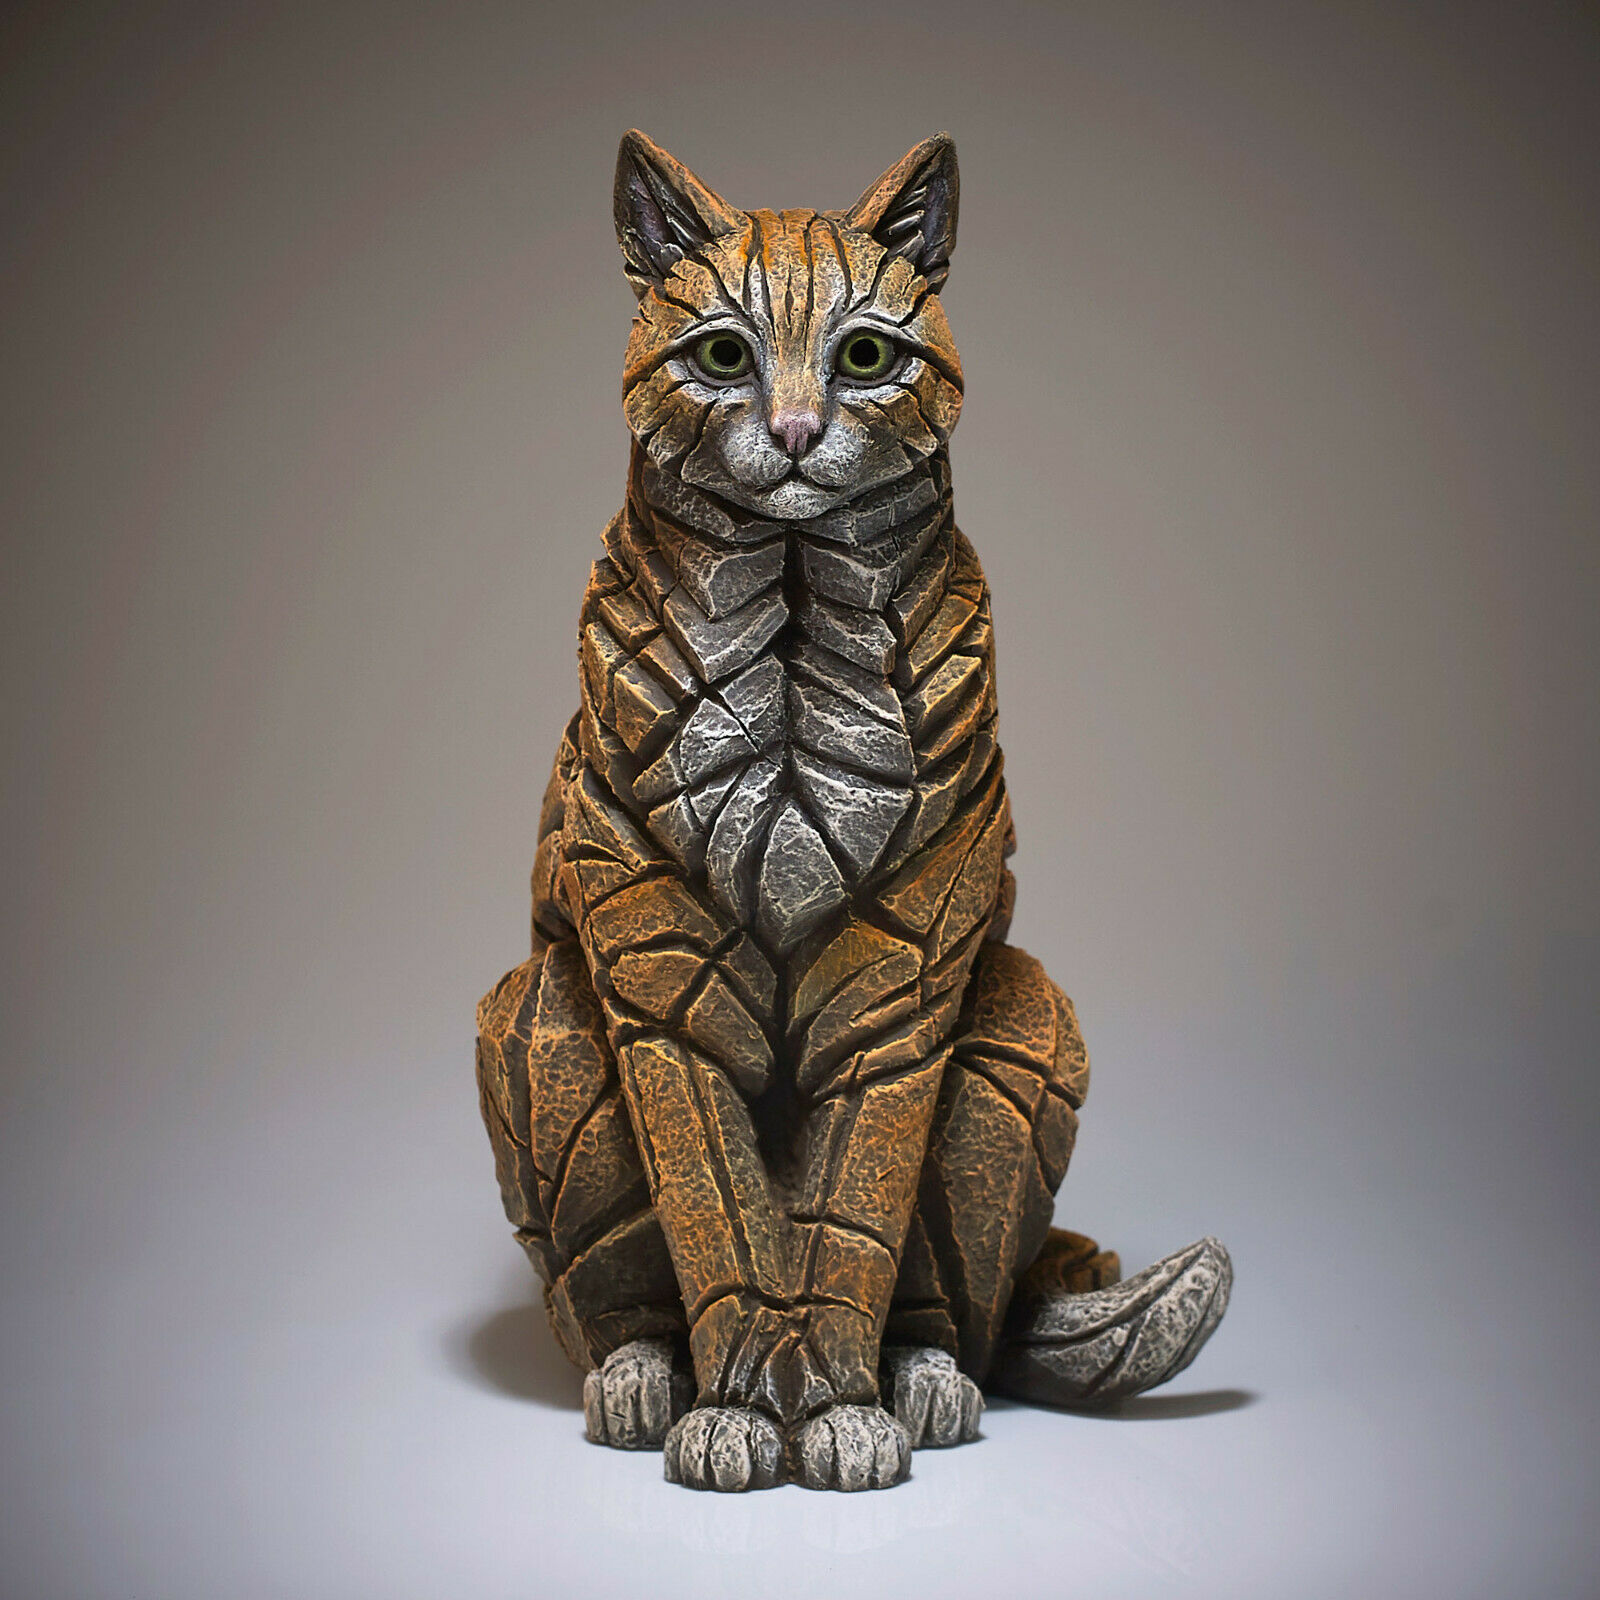 "15"" Sitting Cat Sculpture by Edge Sculpture - Stunning Piece"